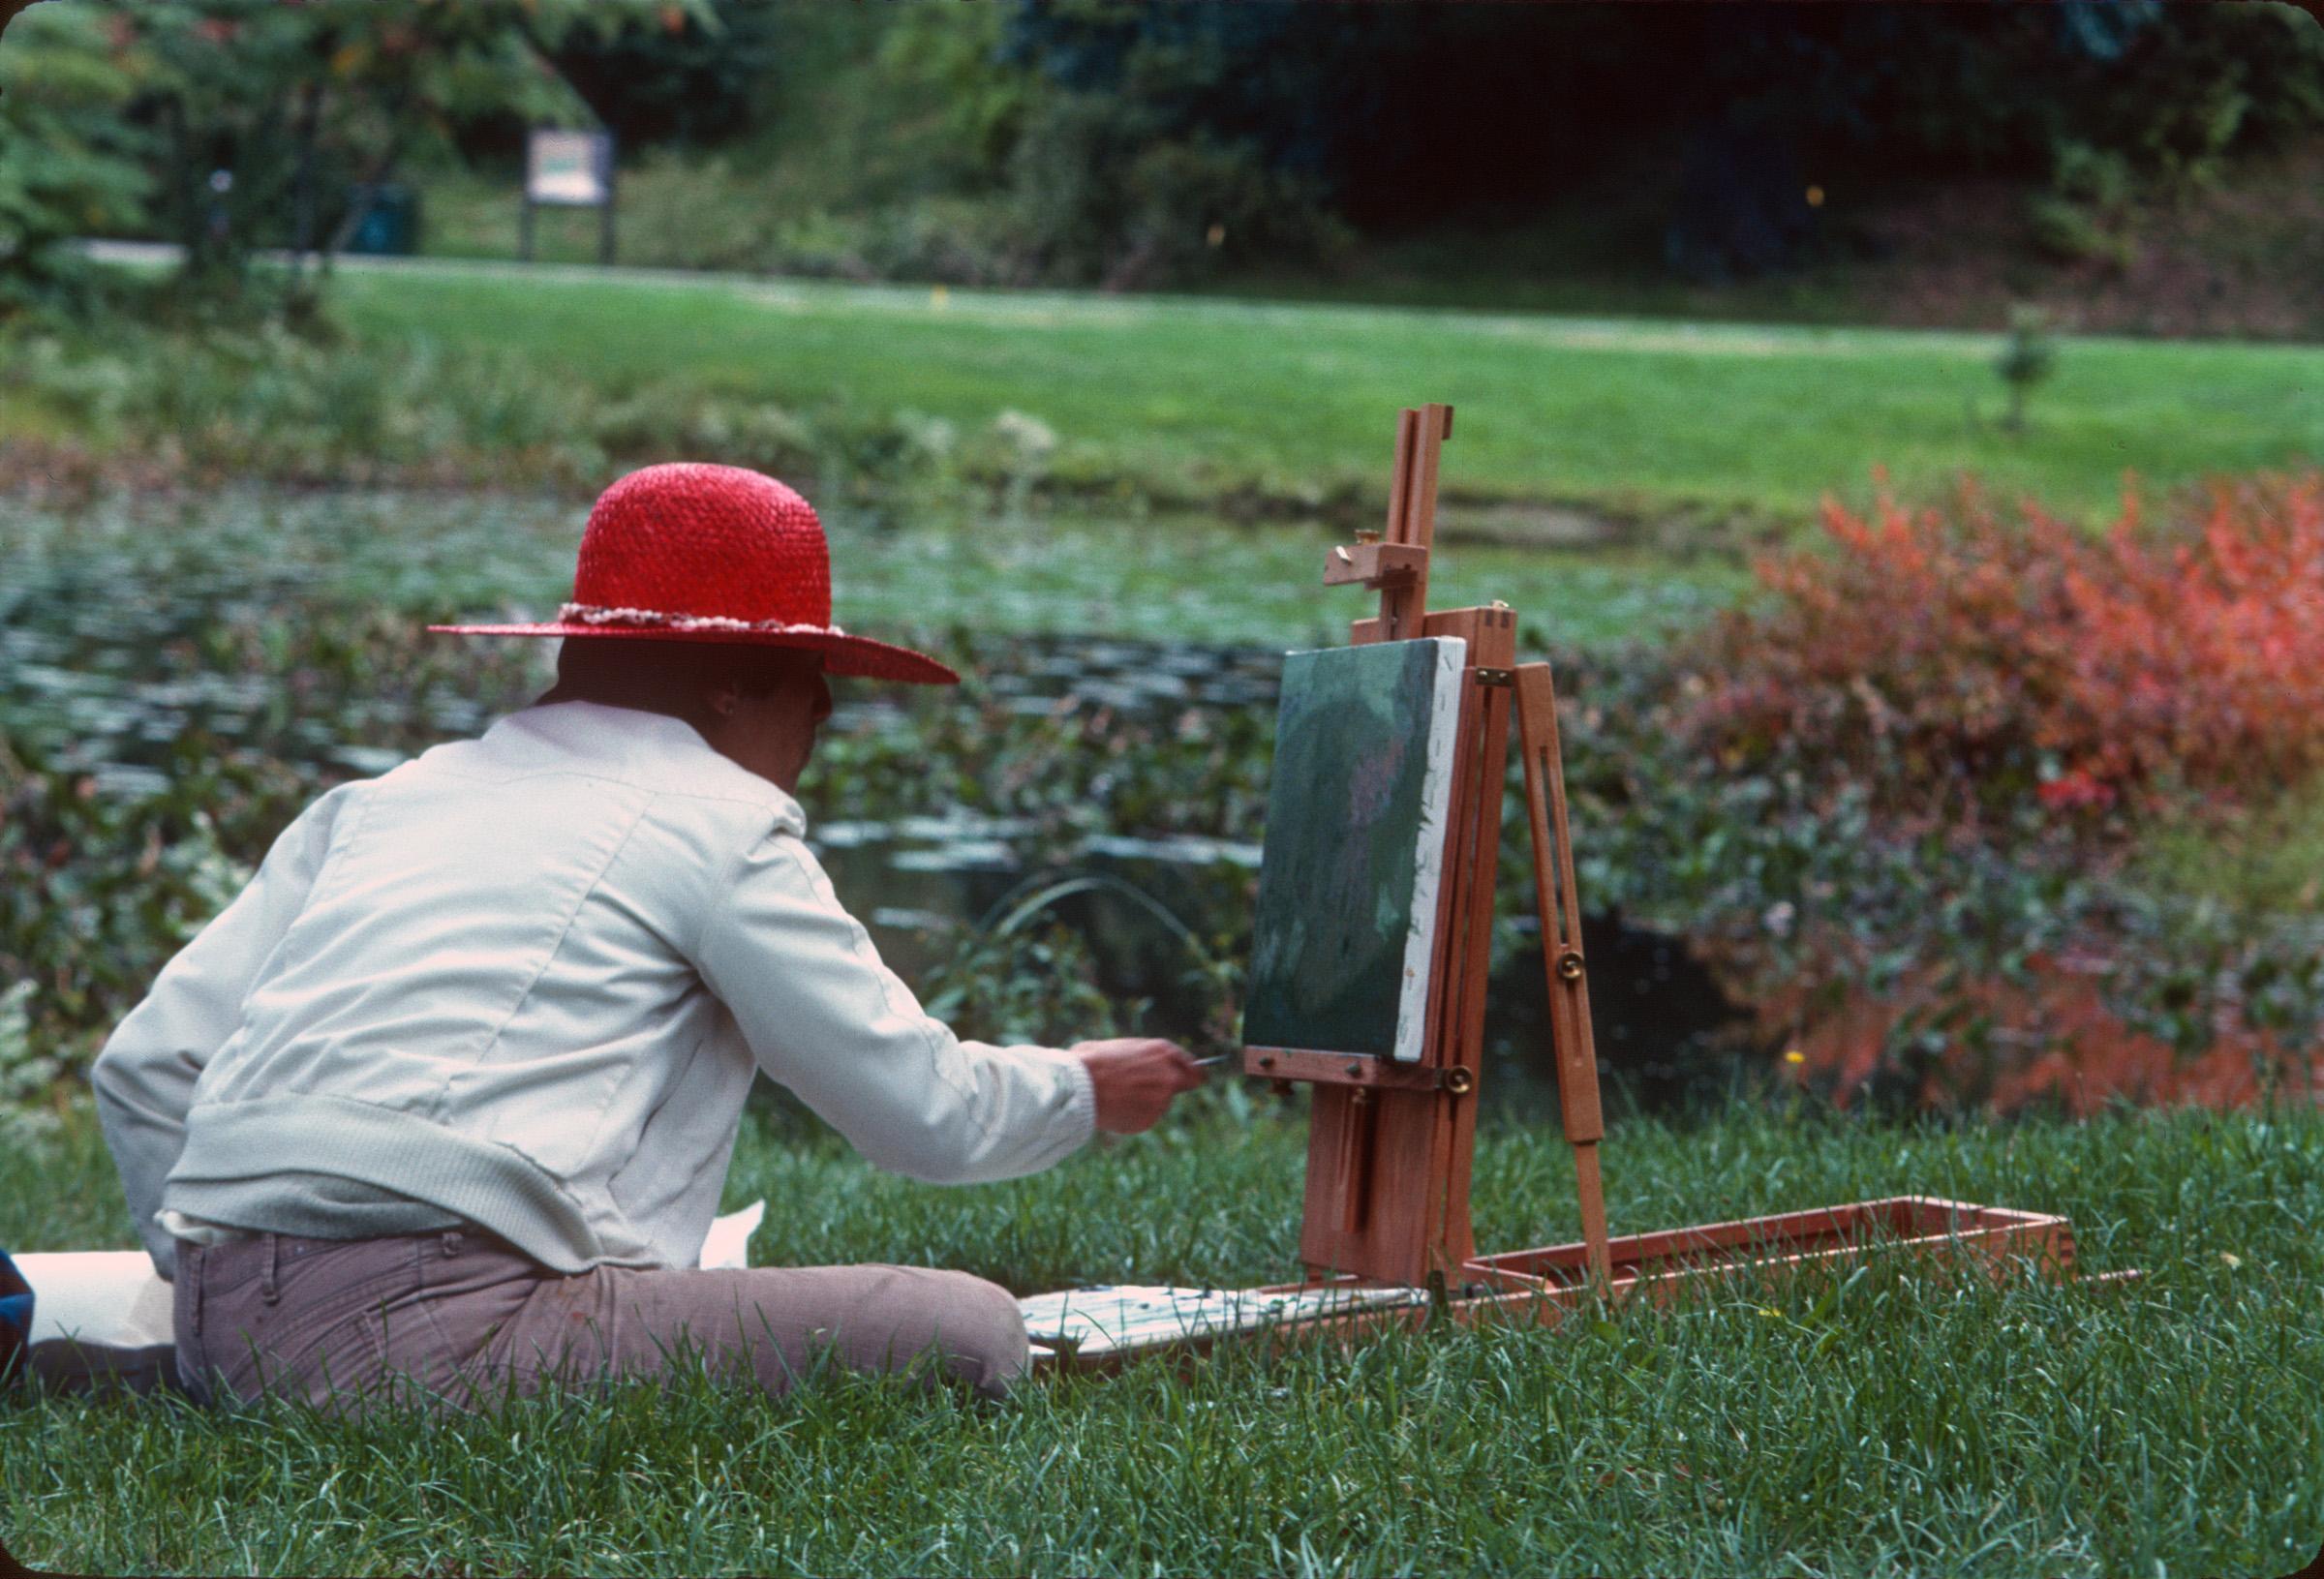 Pondside painter by Albert Bussewitz